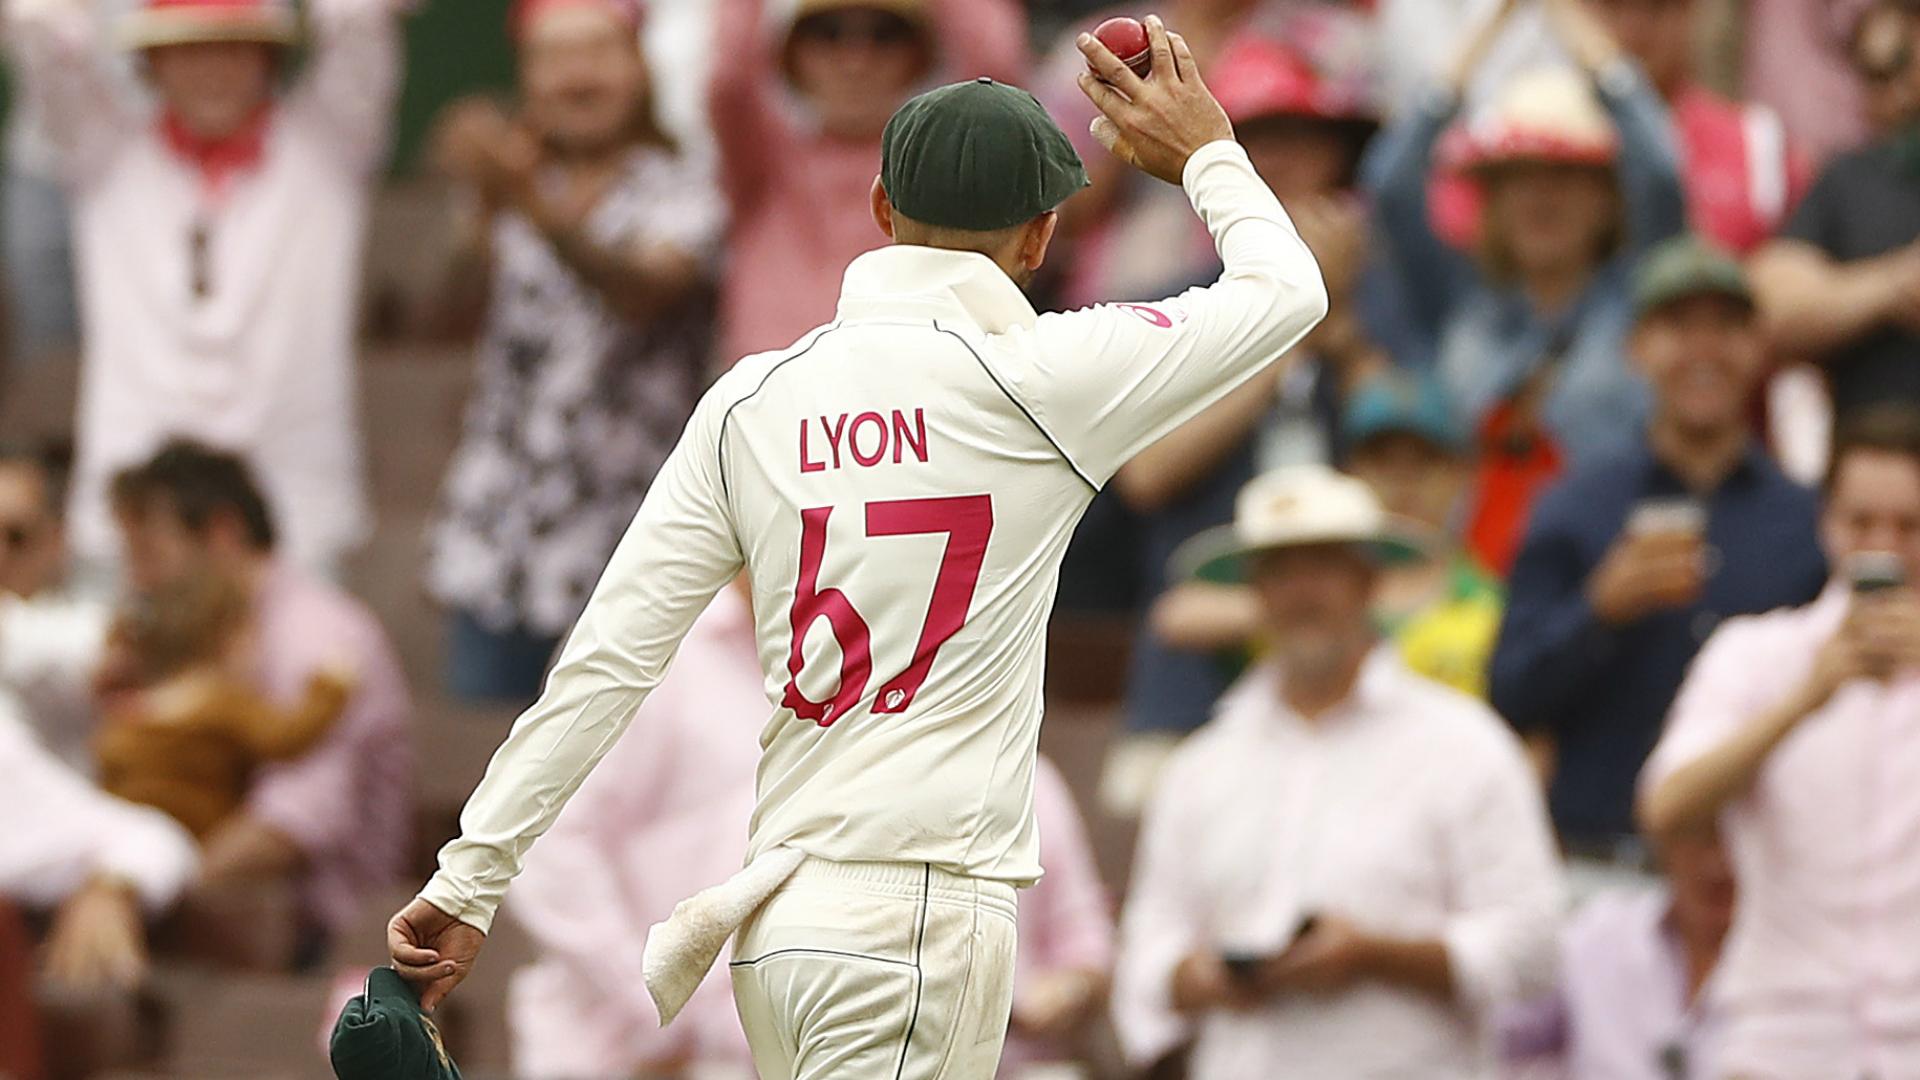 Lyon bags five-for as dominant Australia roll Black Caps